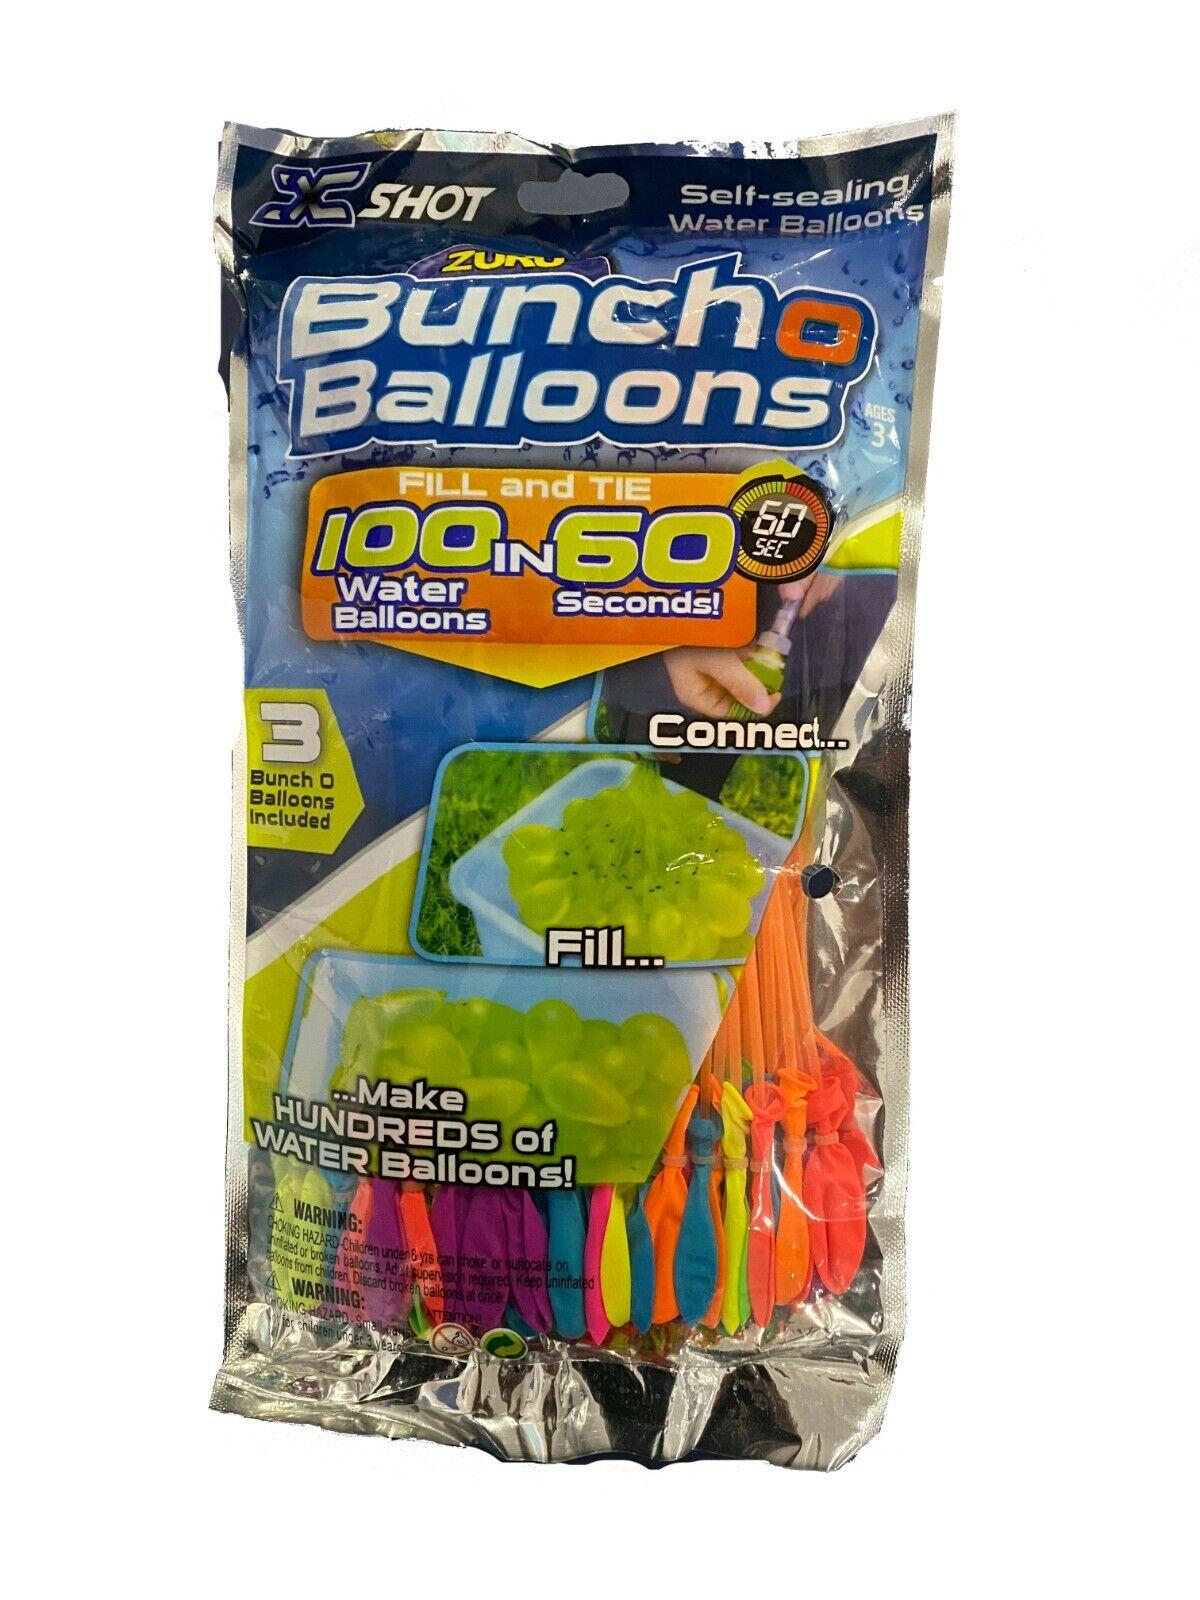 Zuru Bunch O Balloons 1 Package of 100 Self Sealing Water Balloons FREE SHIPPING